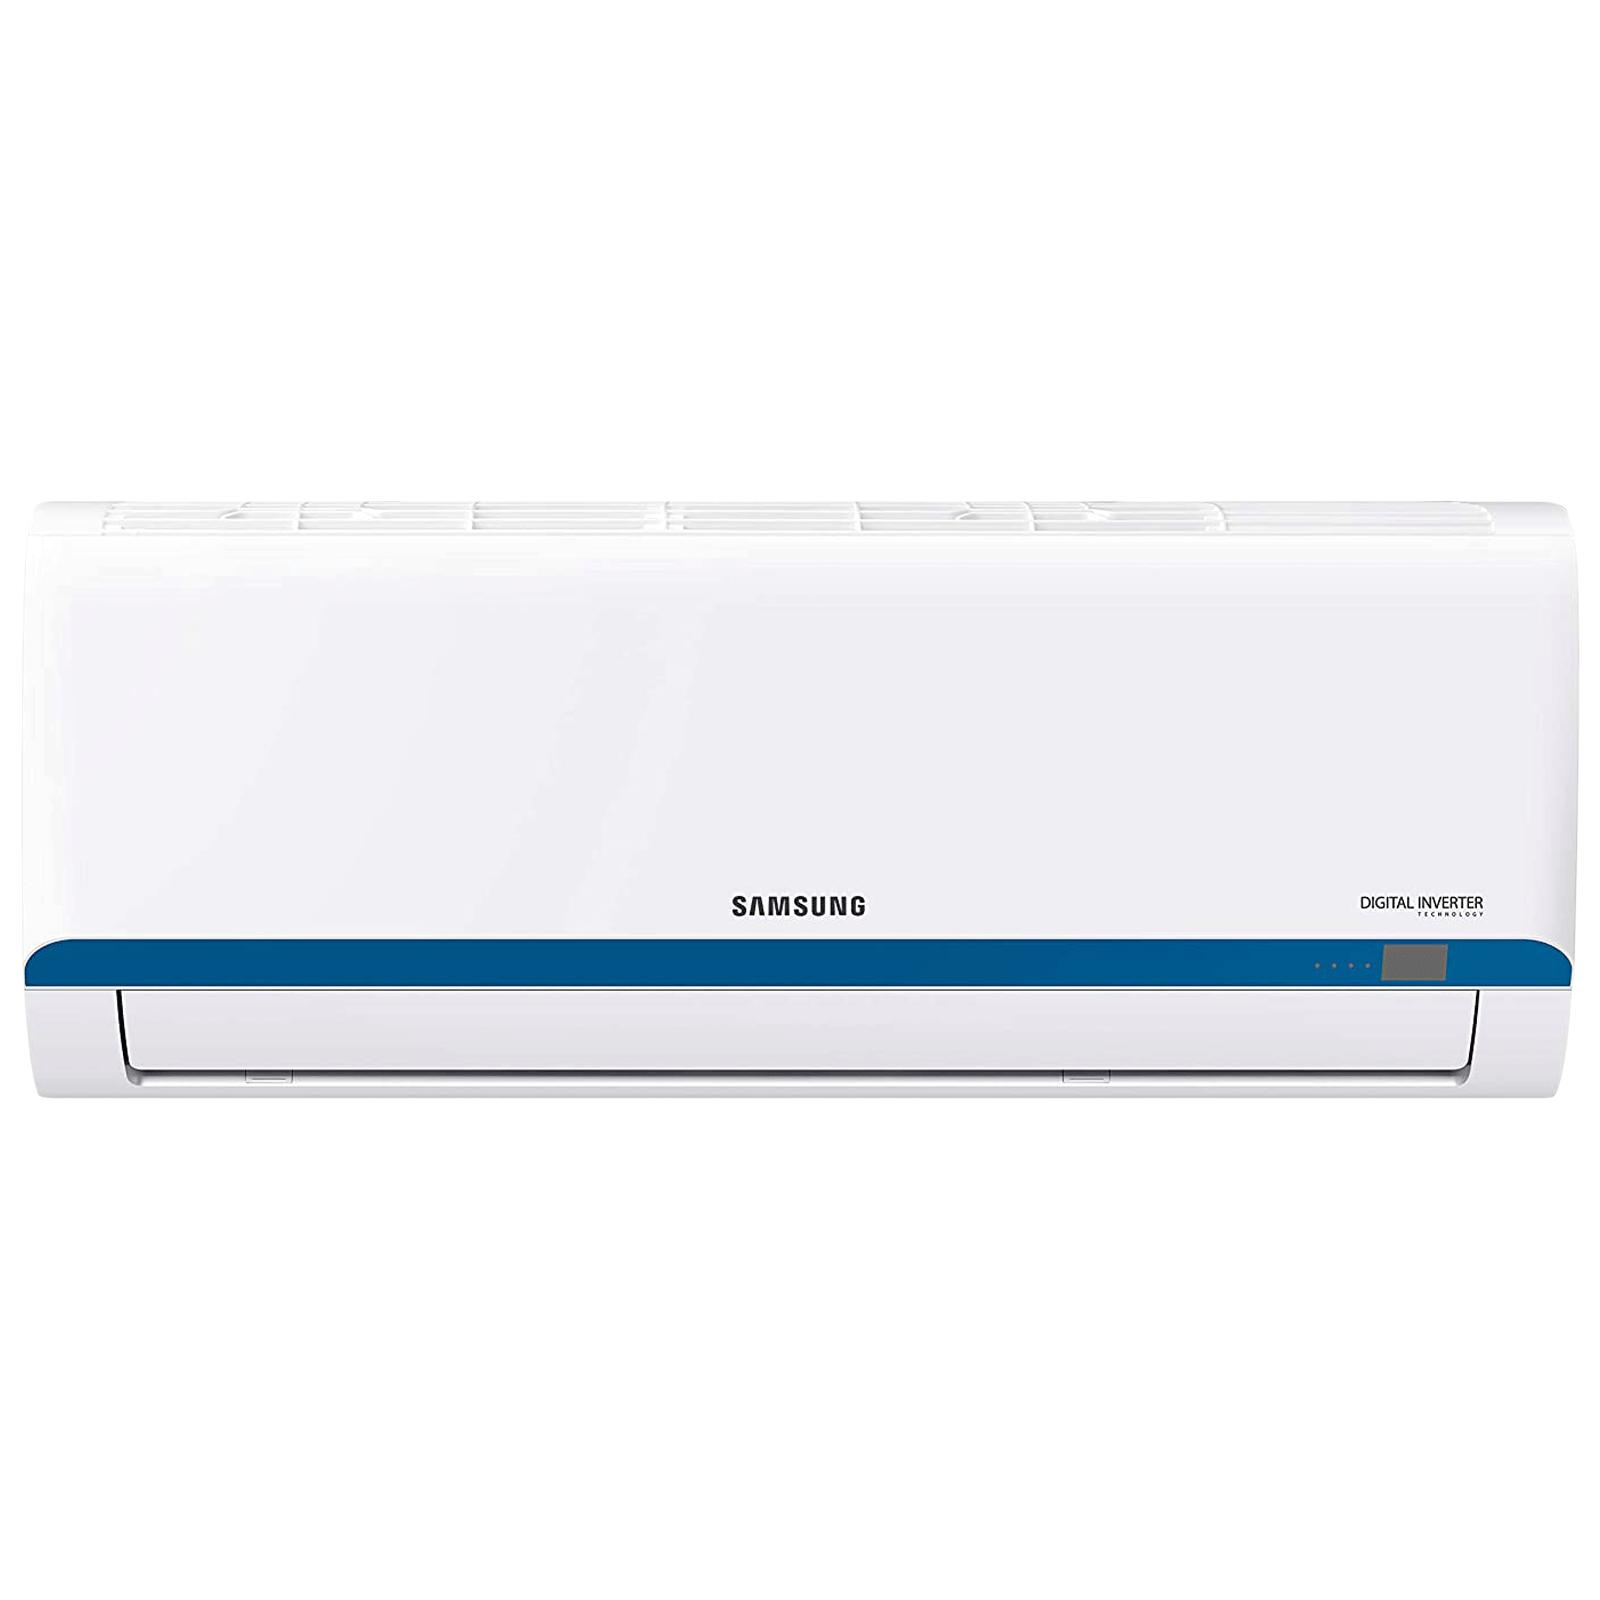 Samsung Super Series 1 Ton 3 Star Inverter Split AC (Copper Condenser, AR12TY3QBBU, White)_1